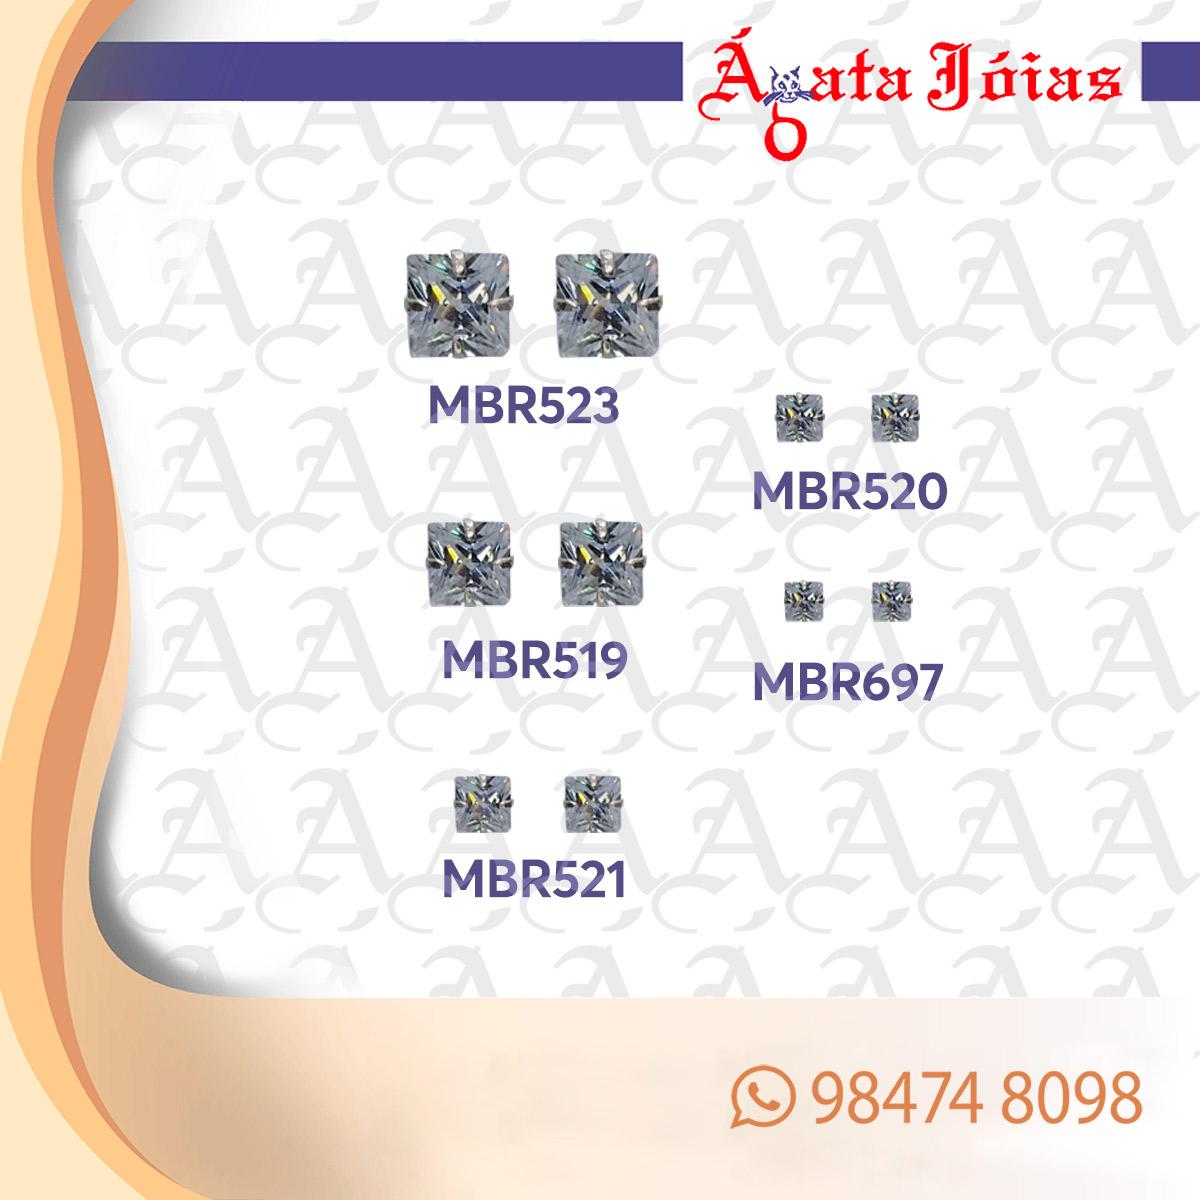 MBR520